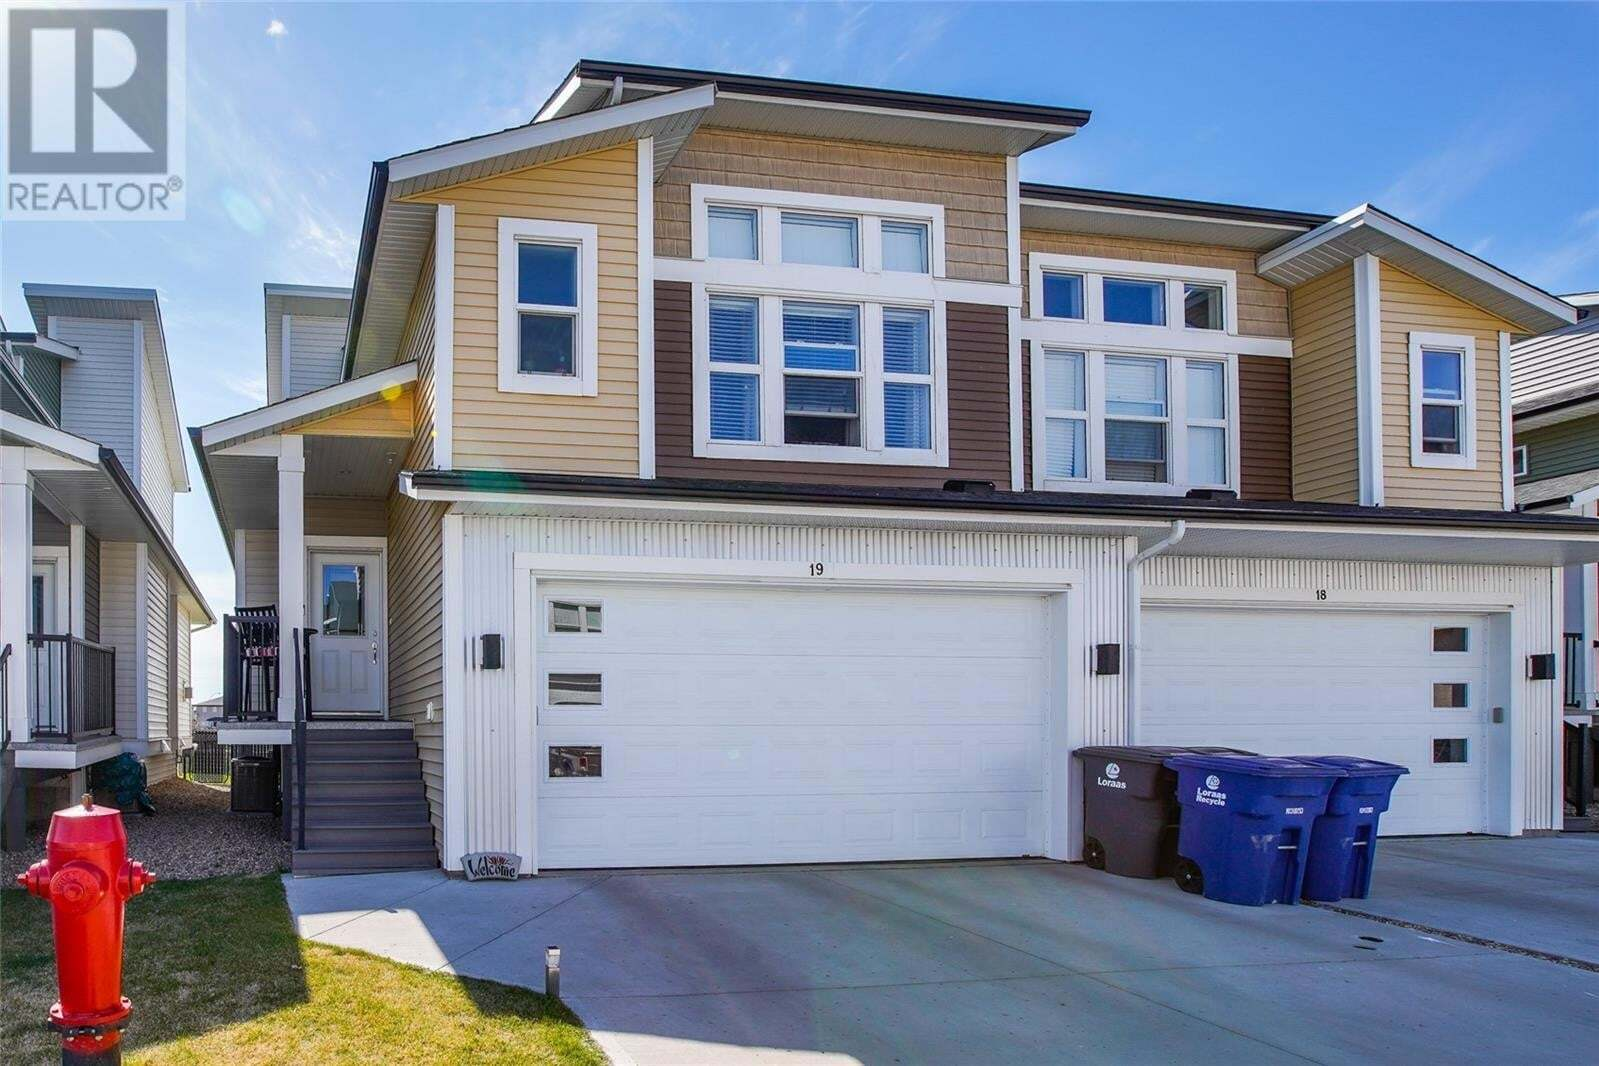 House for sale at 700 Central St W Unit 19 Warman Saskatchewan - MLS: SK809416